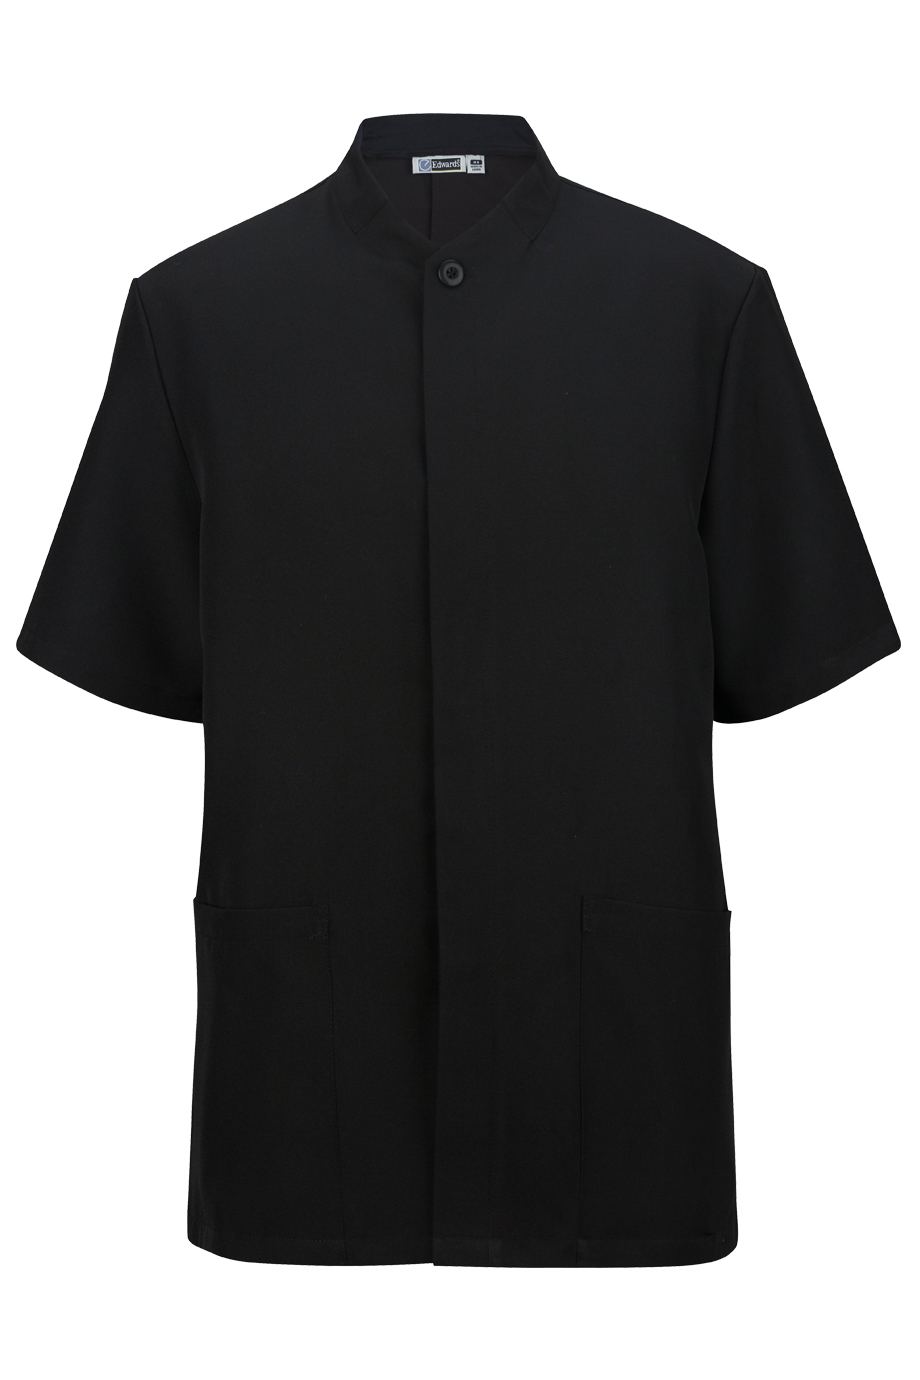 Service Shirts